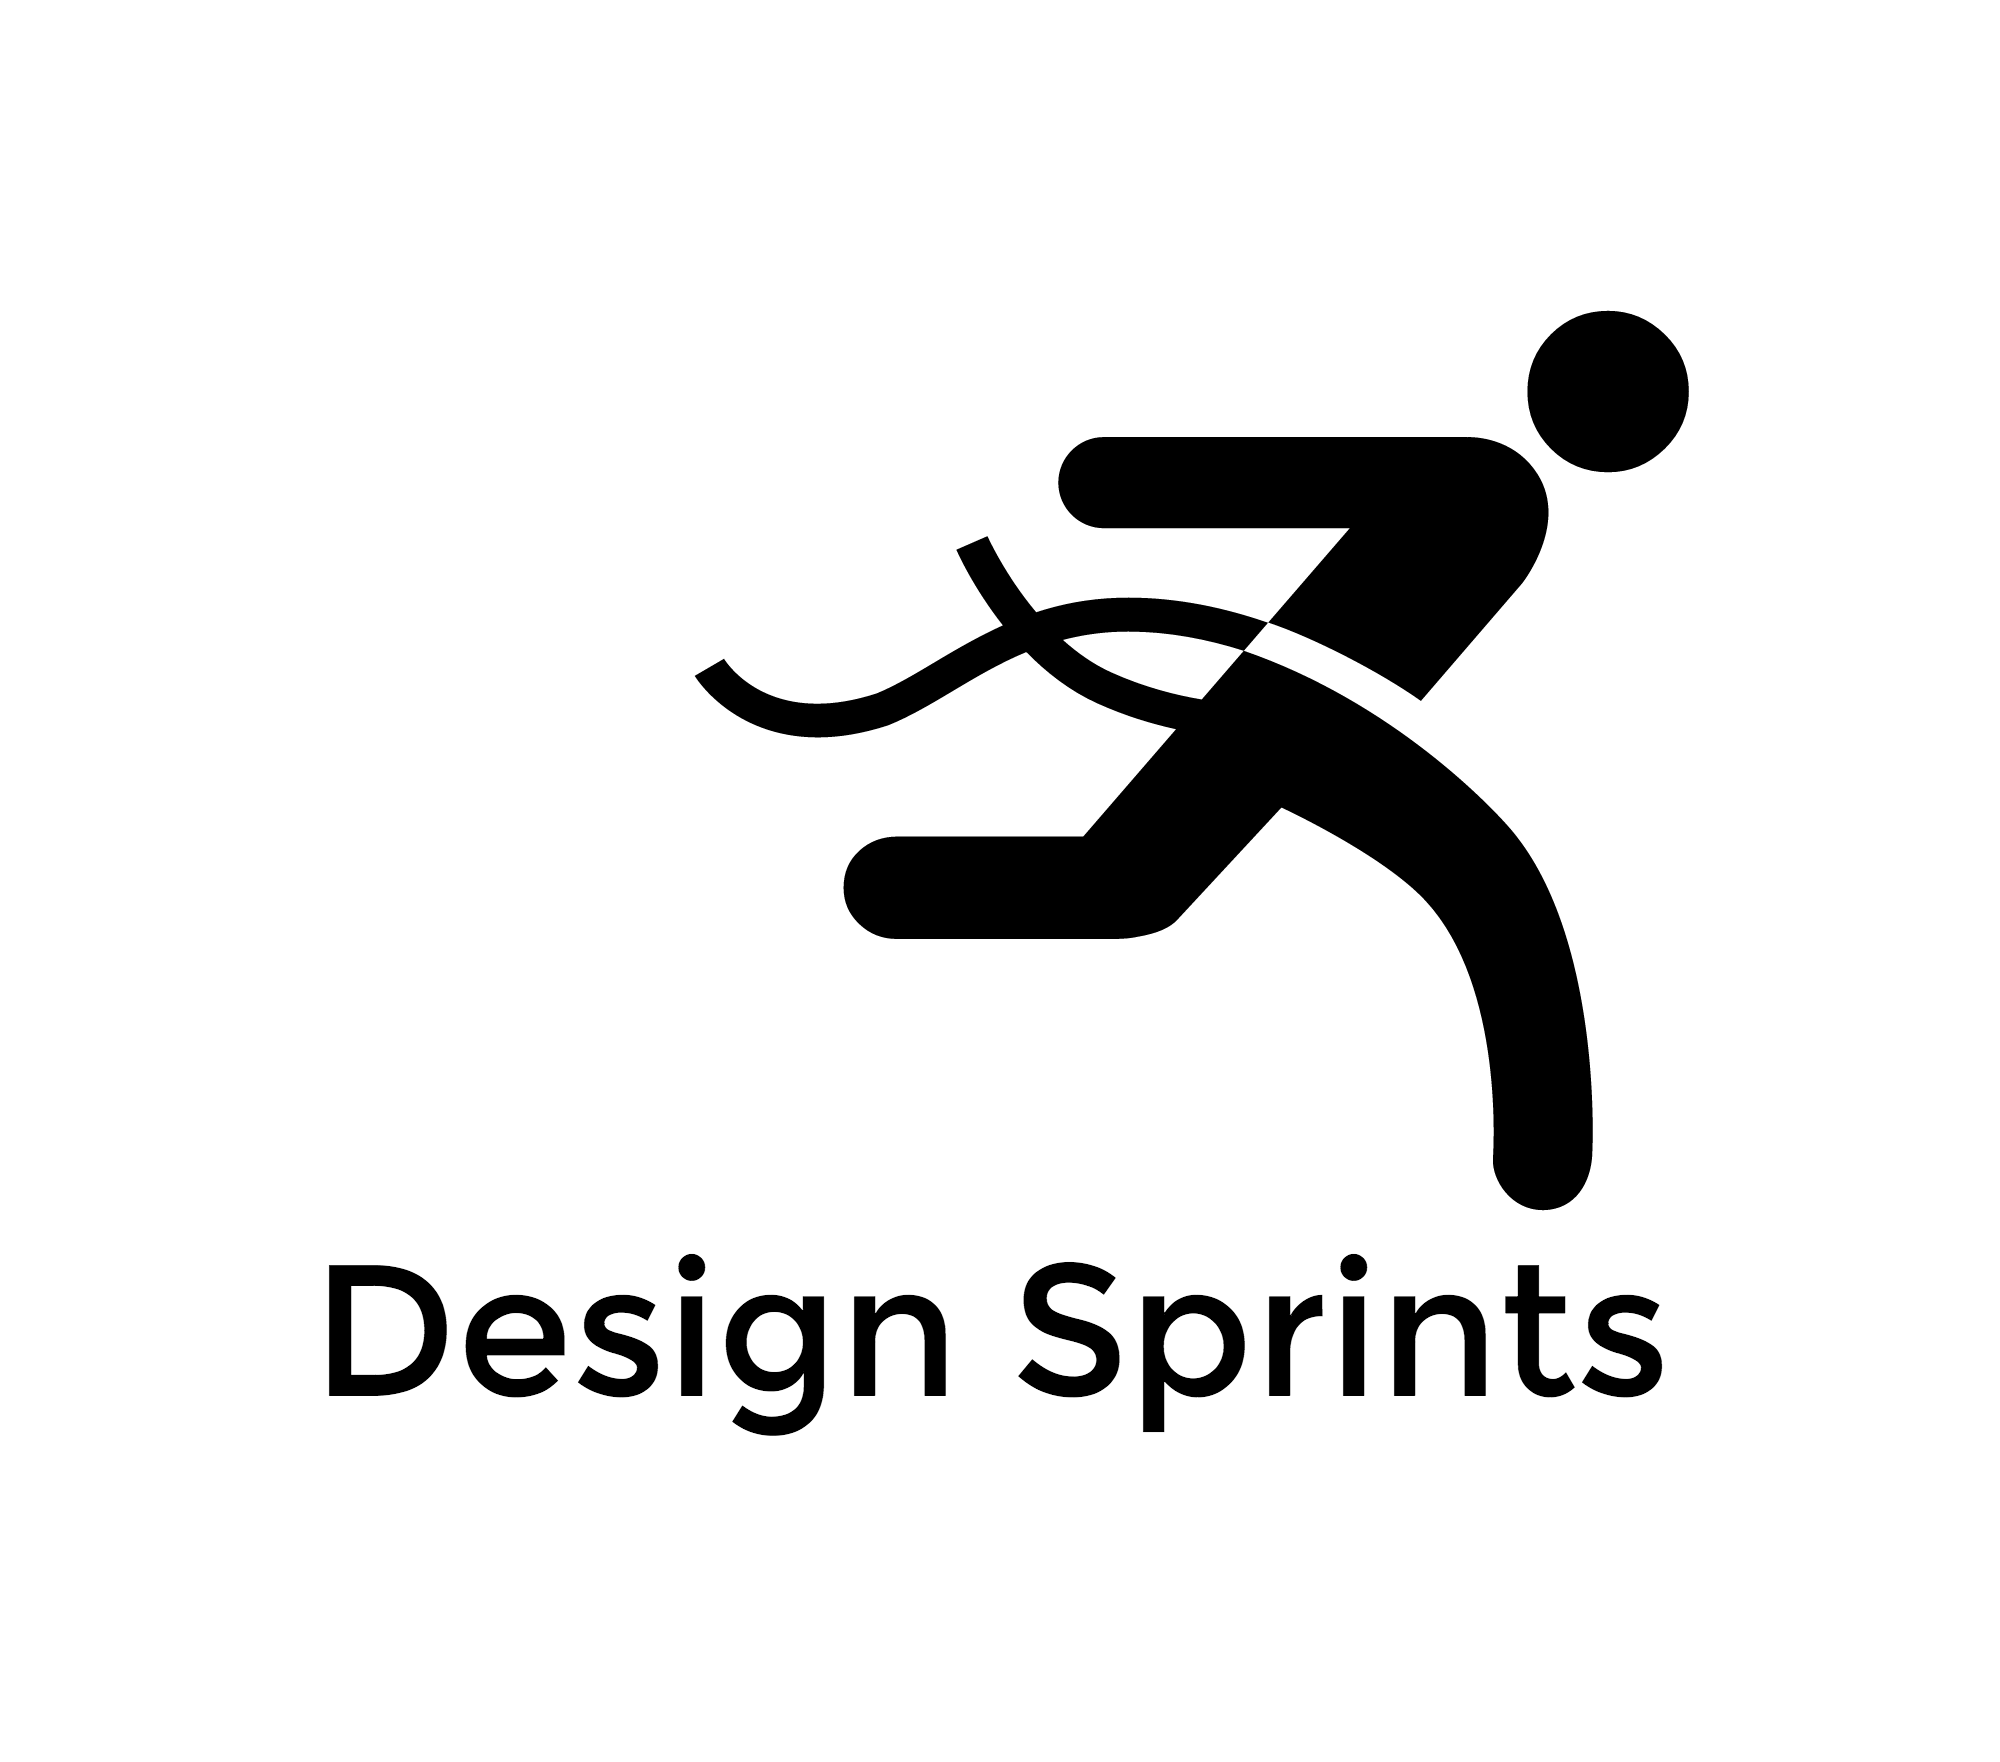 logo-black(3).png